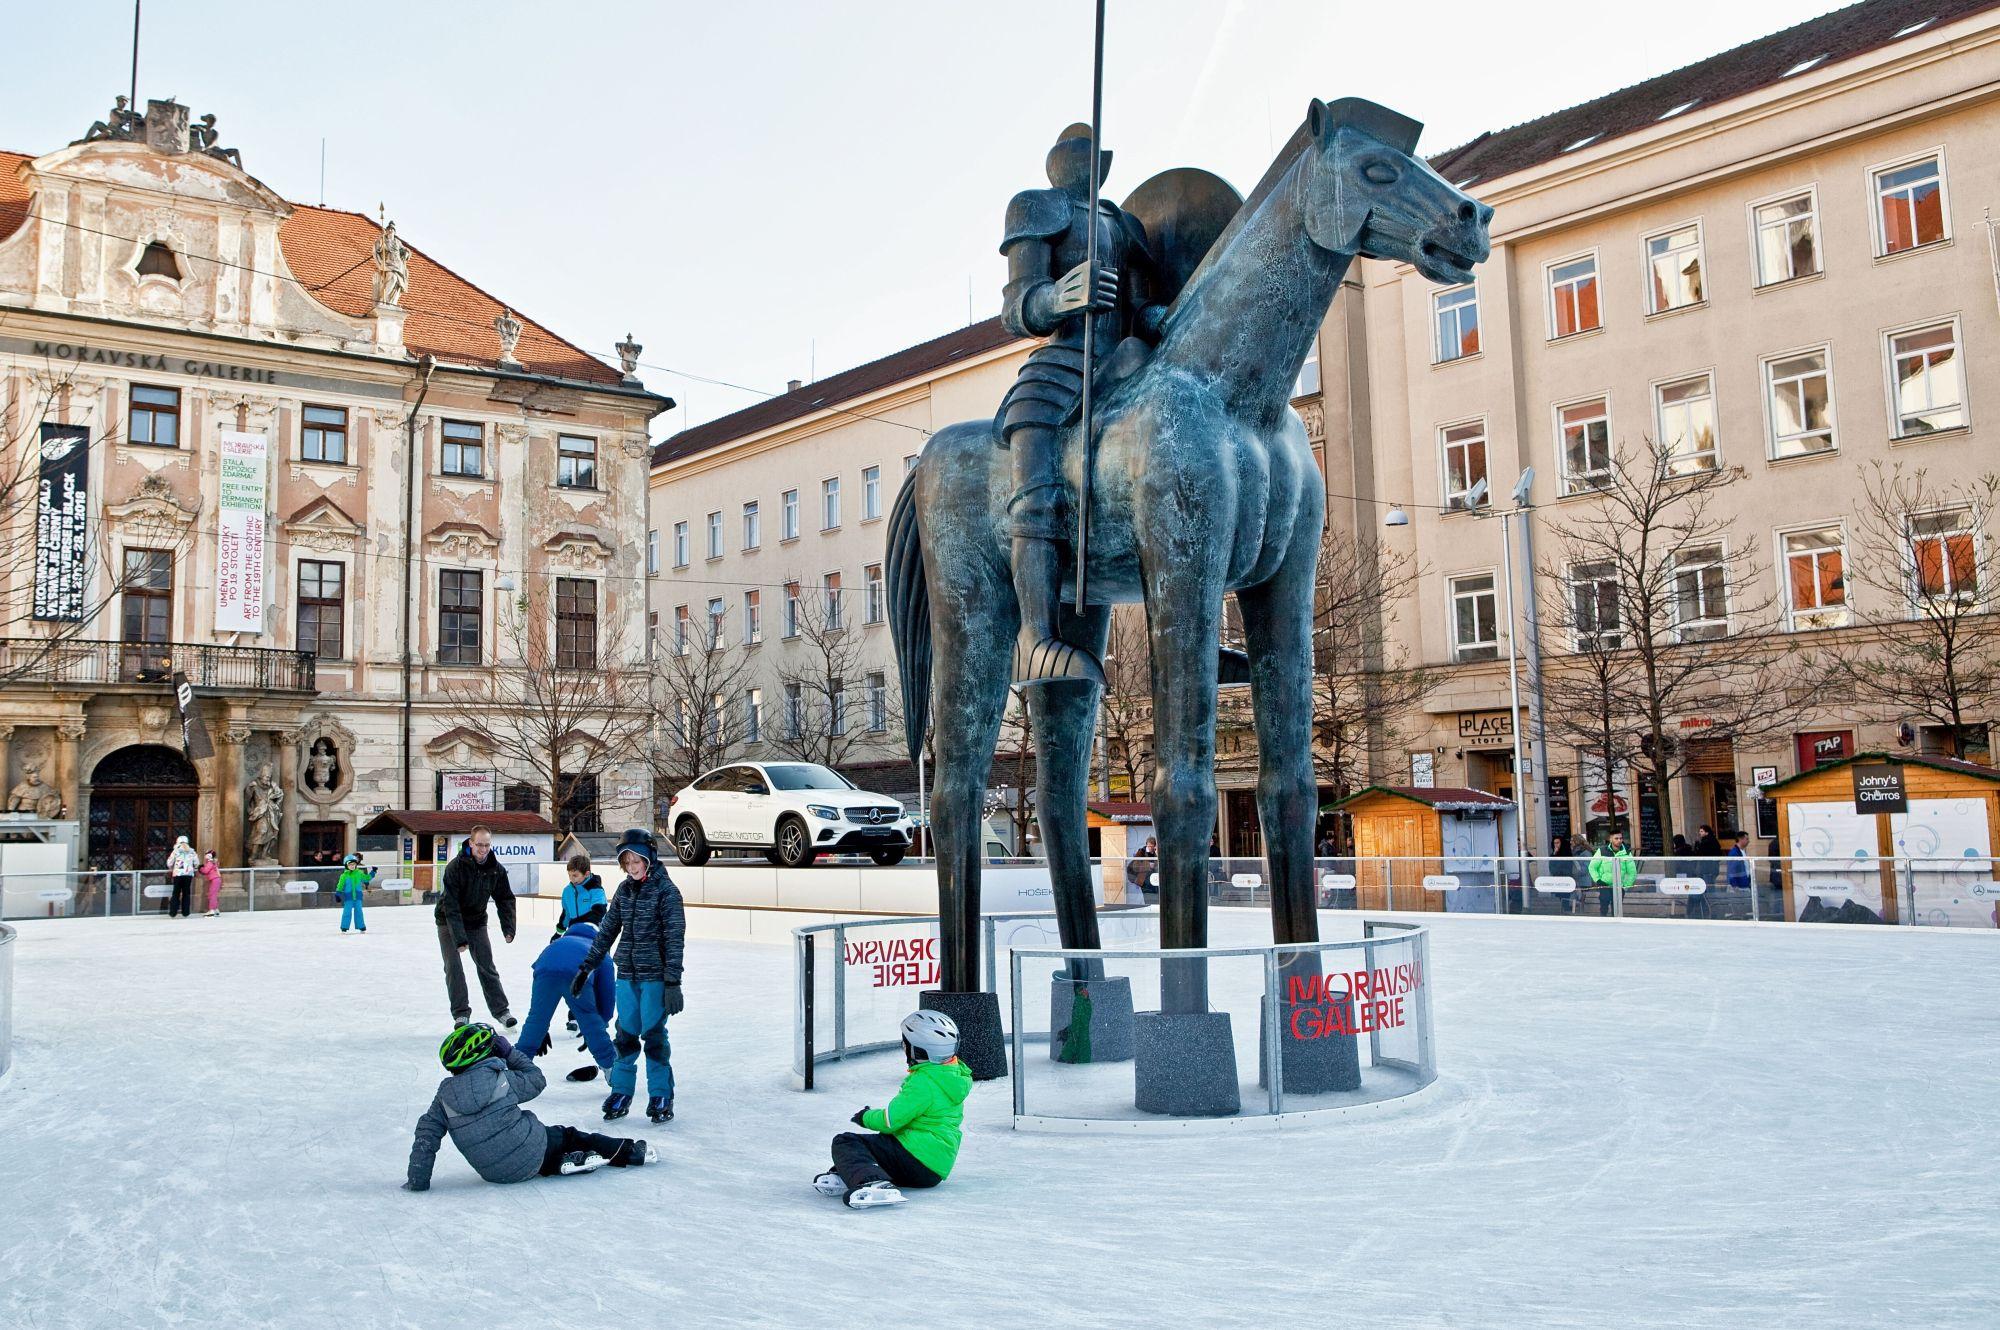 Bruslák (Ice rink)